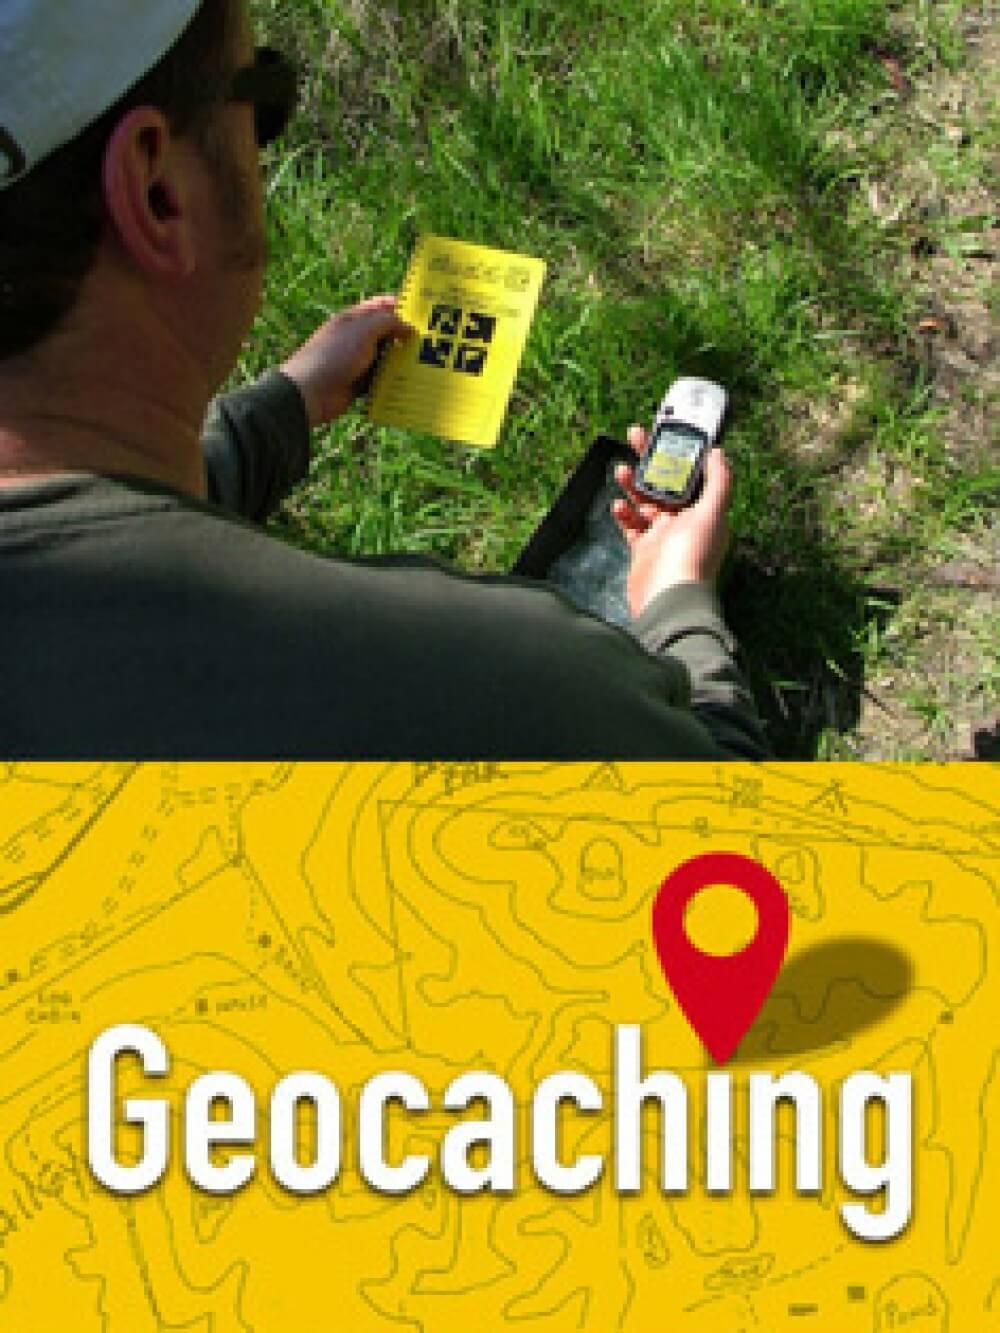 geocaching_vertical_web